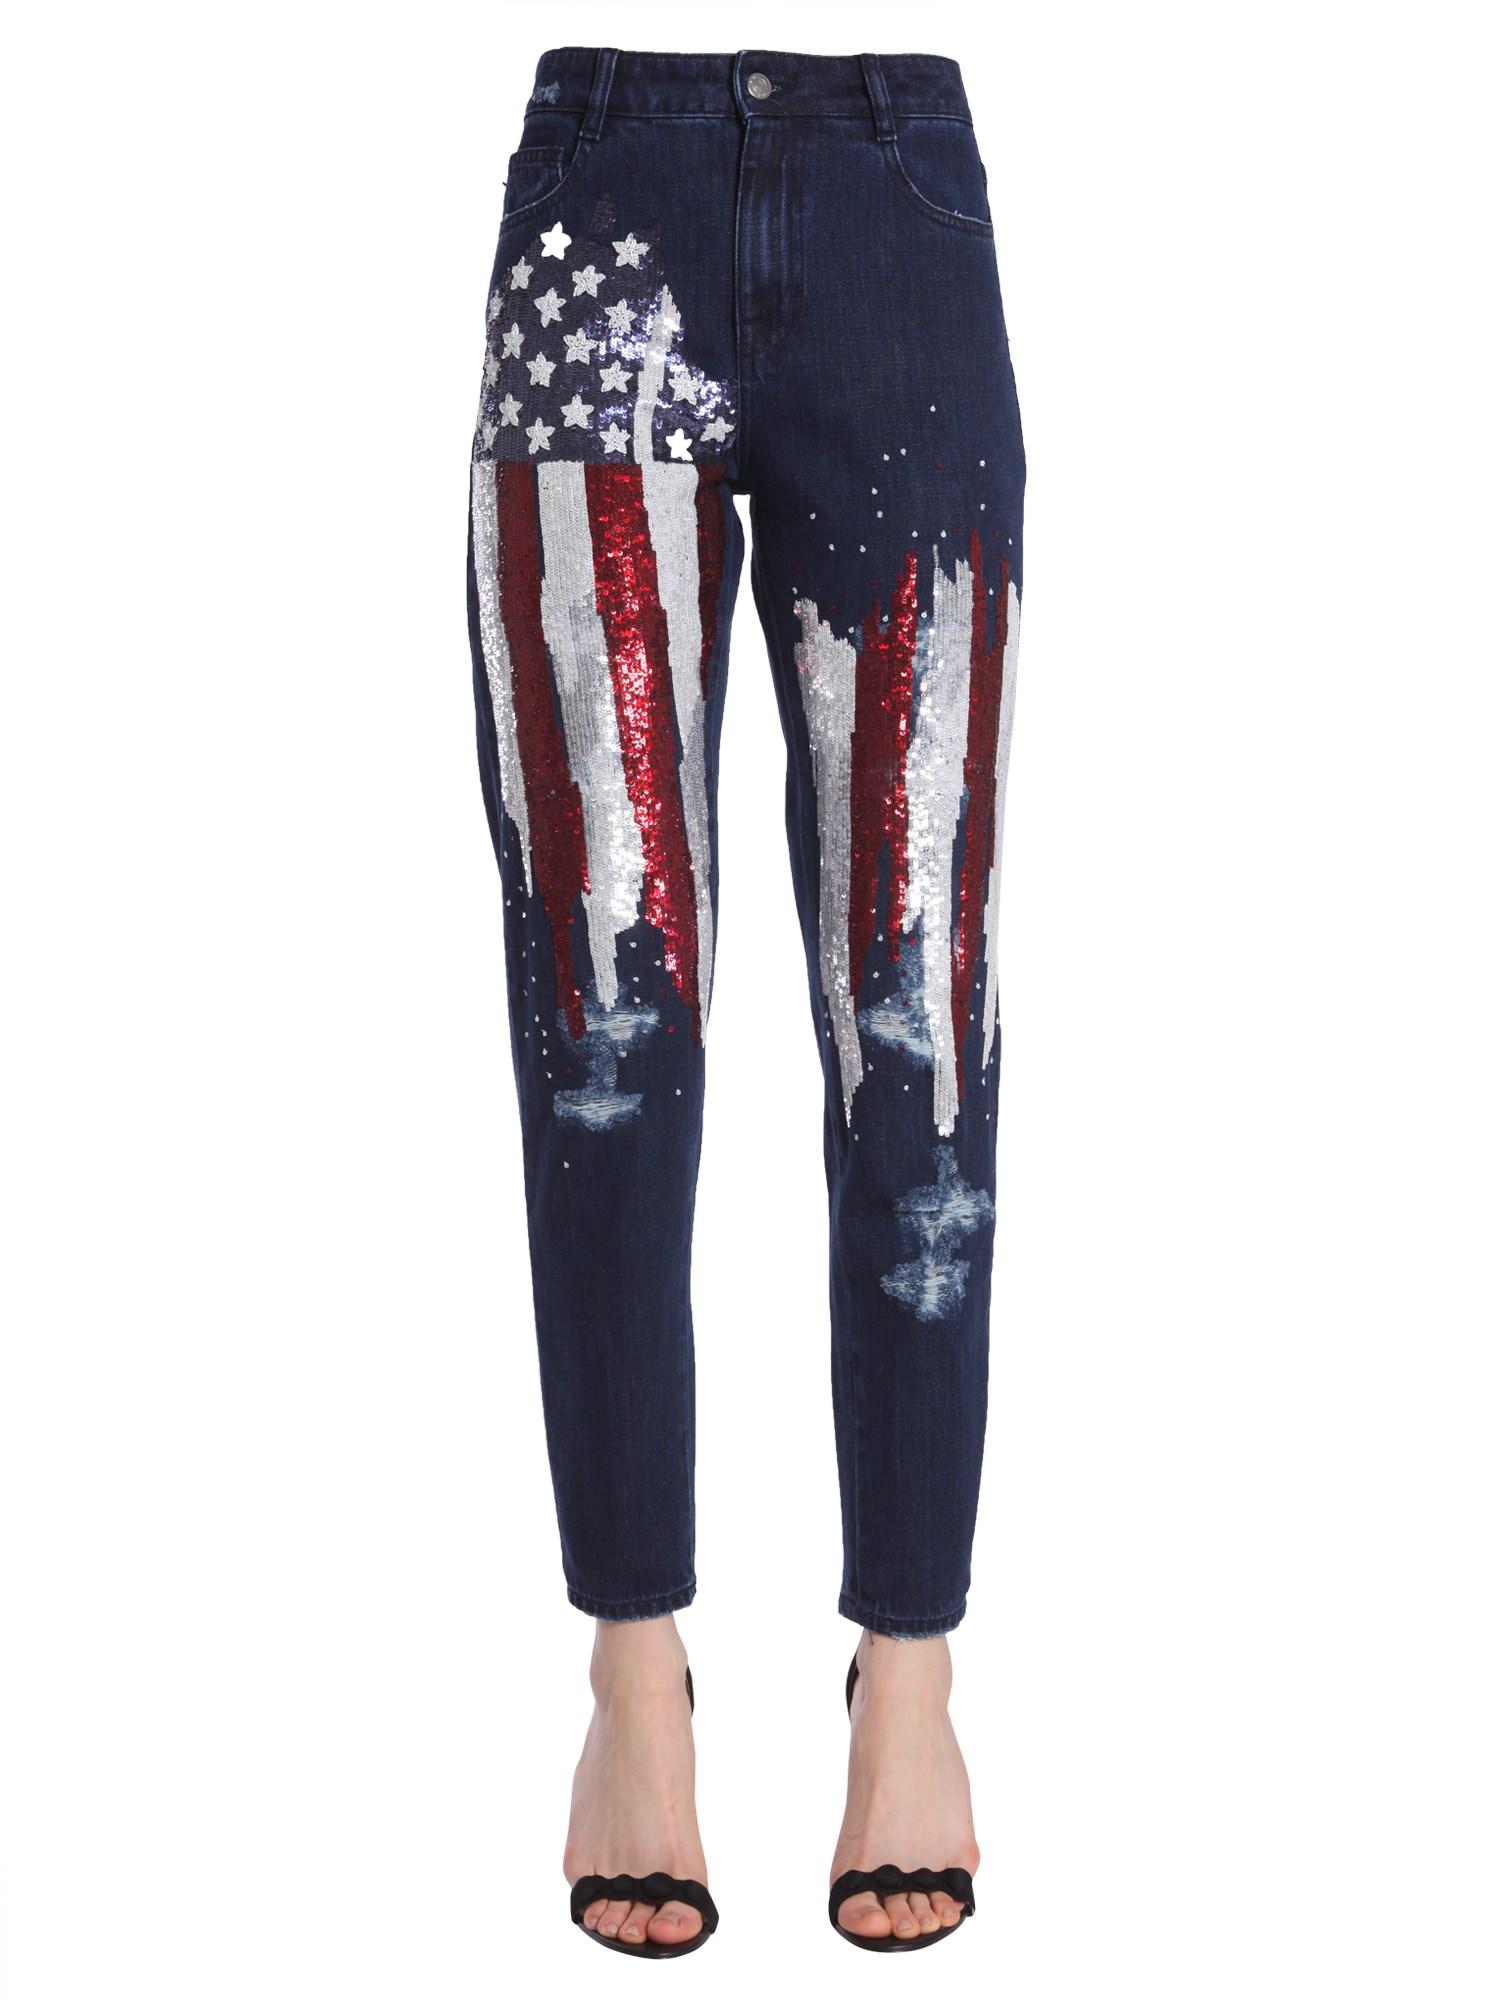 Amen new boyfriend jeans - amen - Modalova